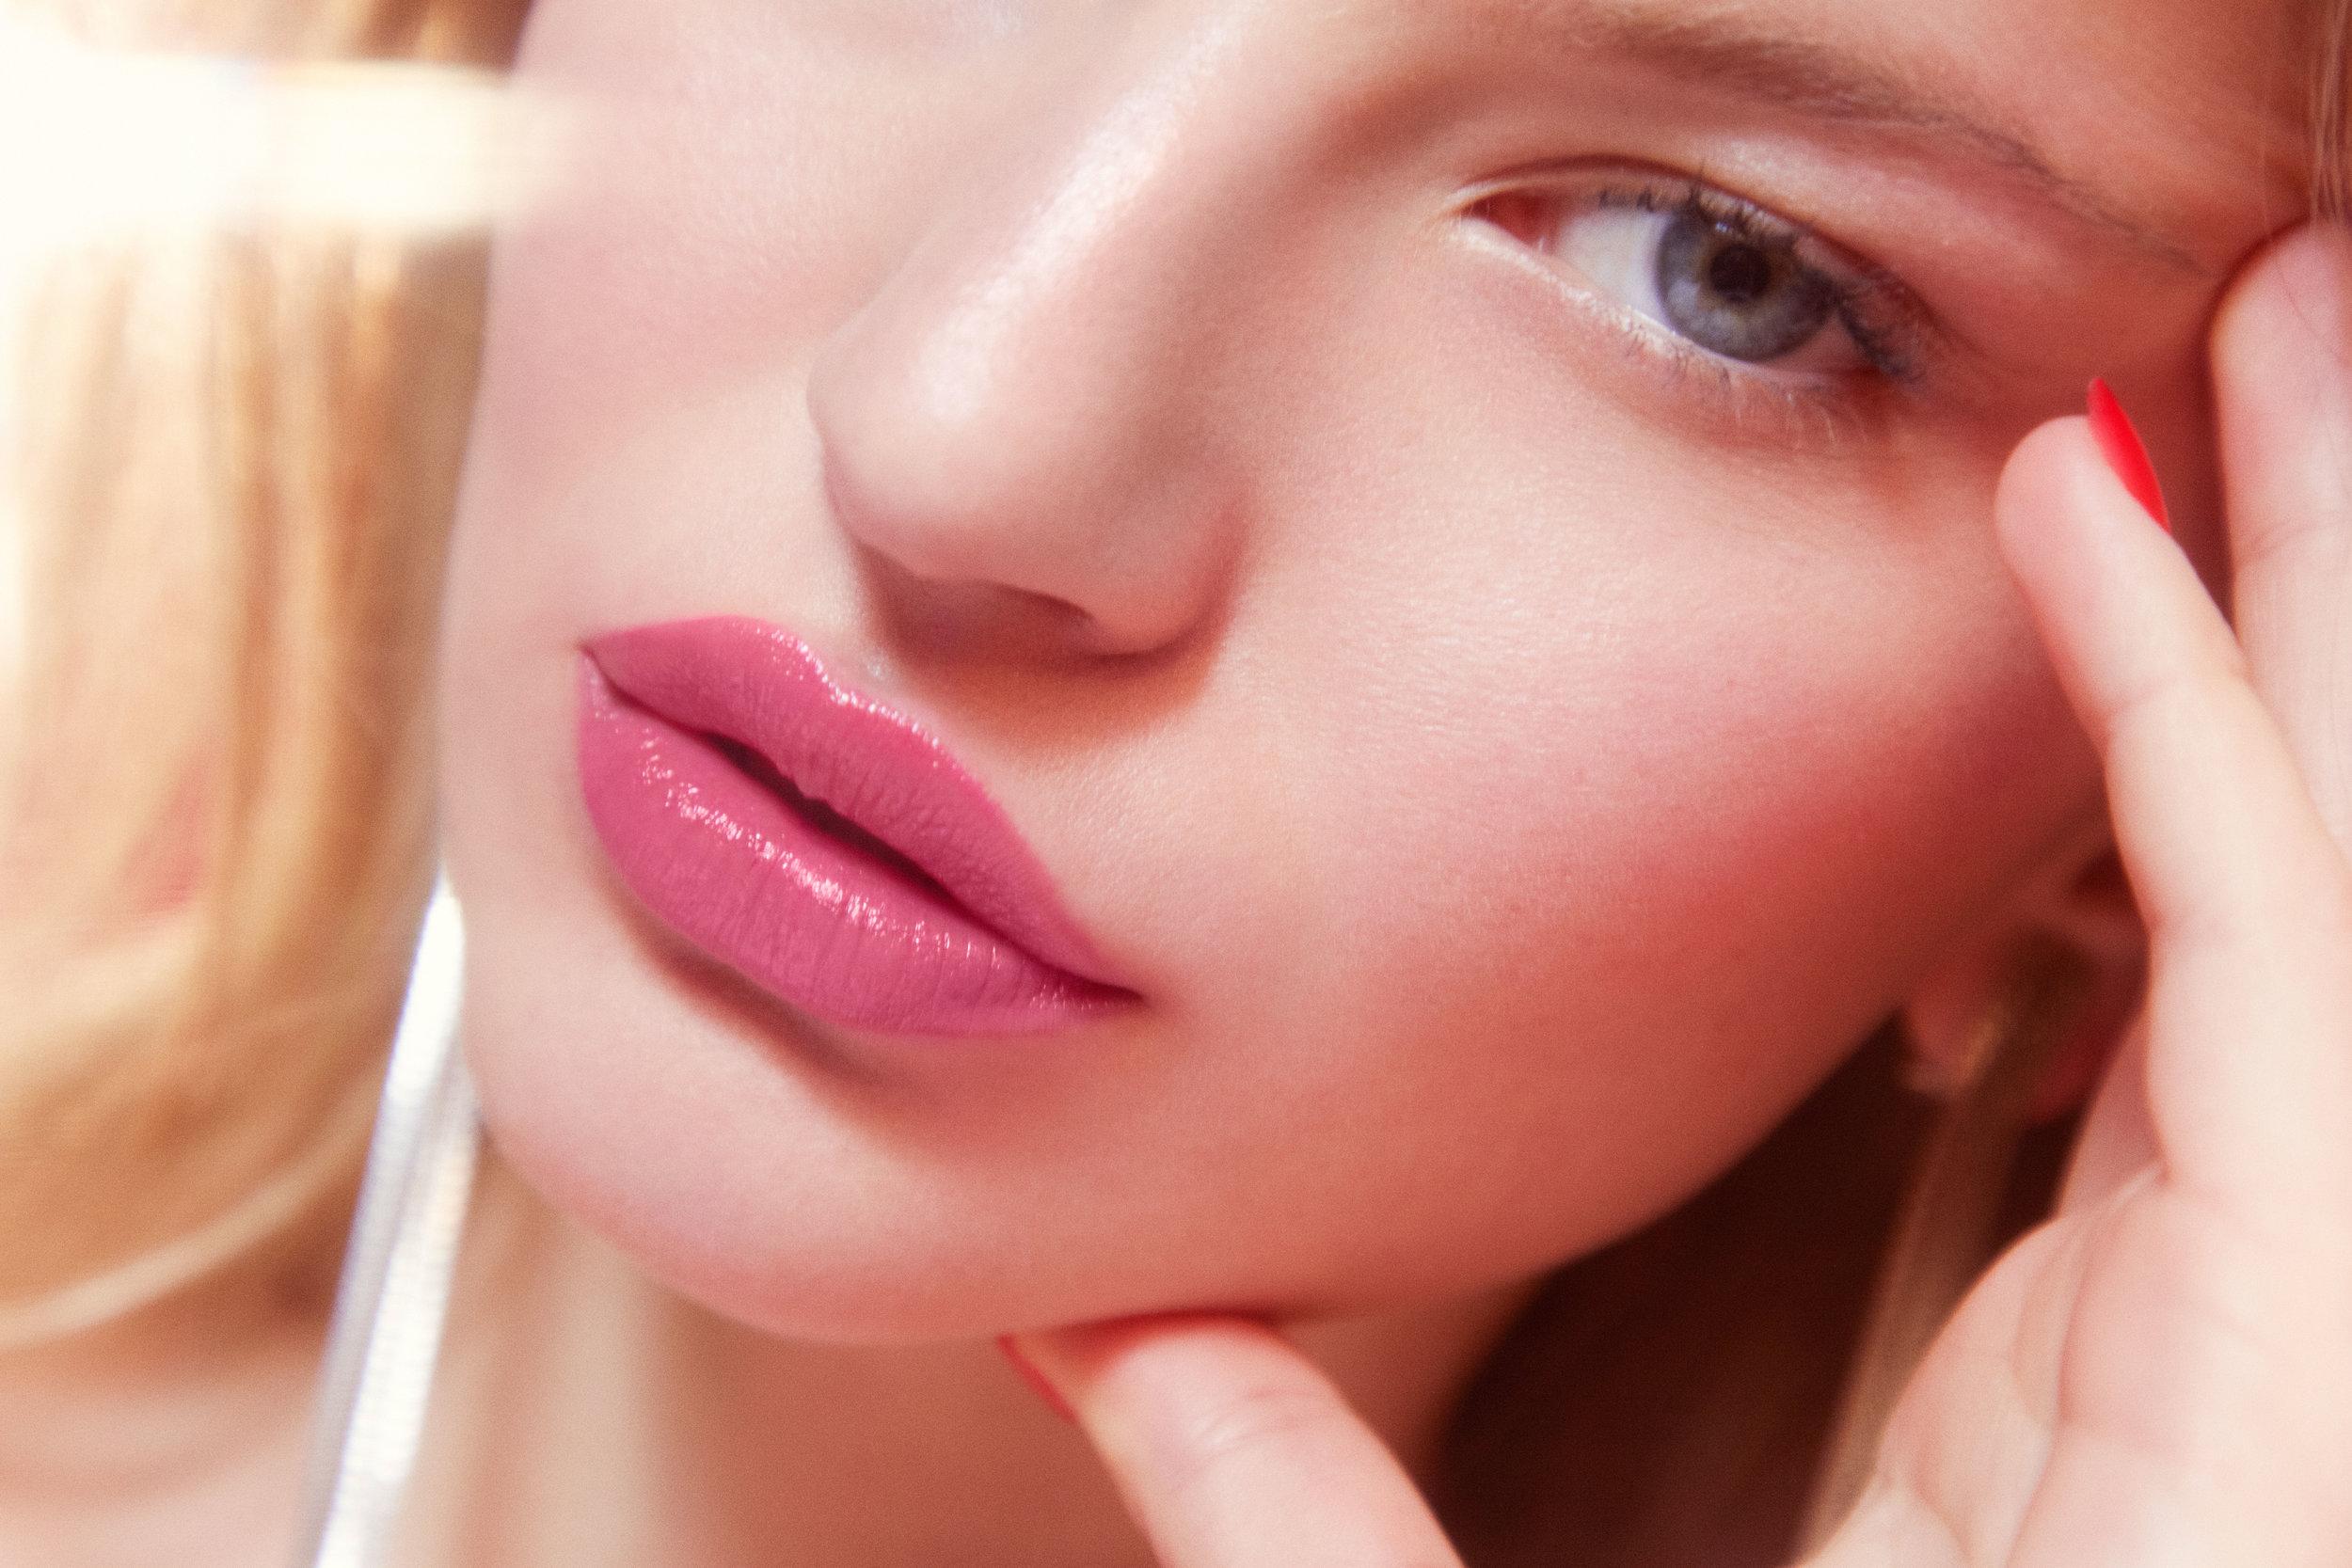 1_RDY_Play_Mariana_EMILY-GRACE_VNL-BLO_010.jpg